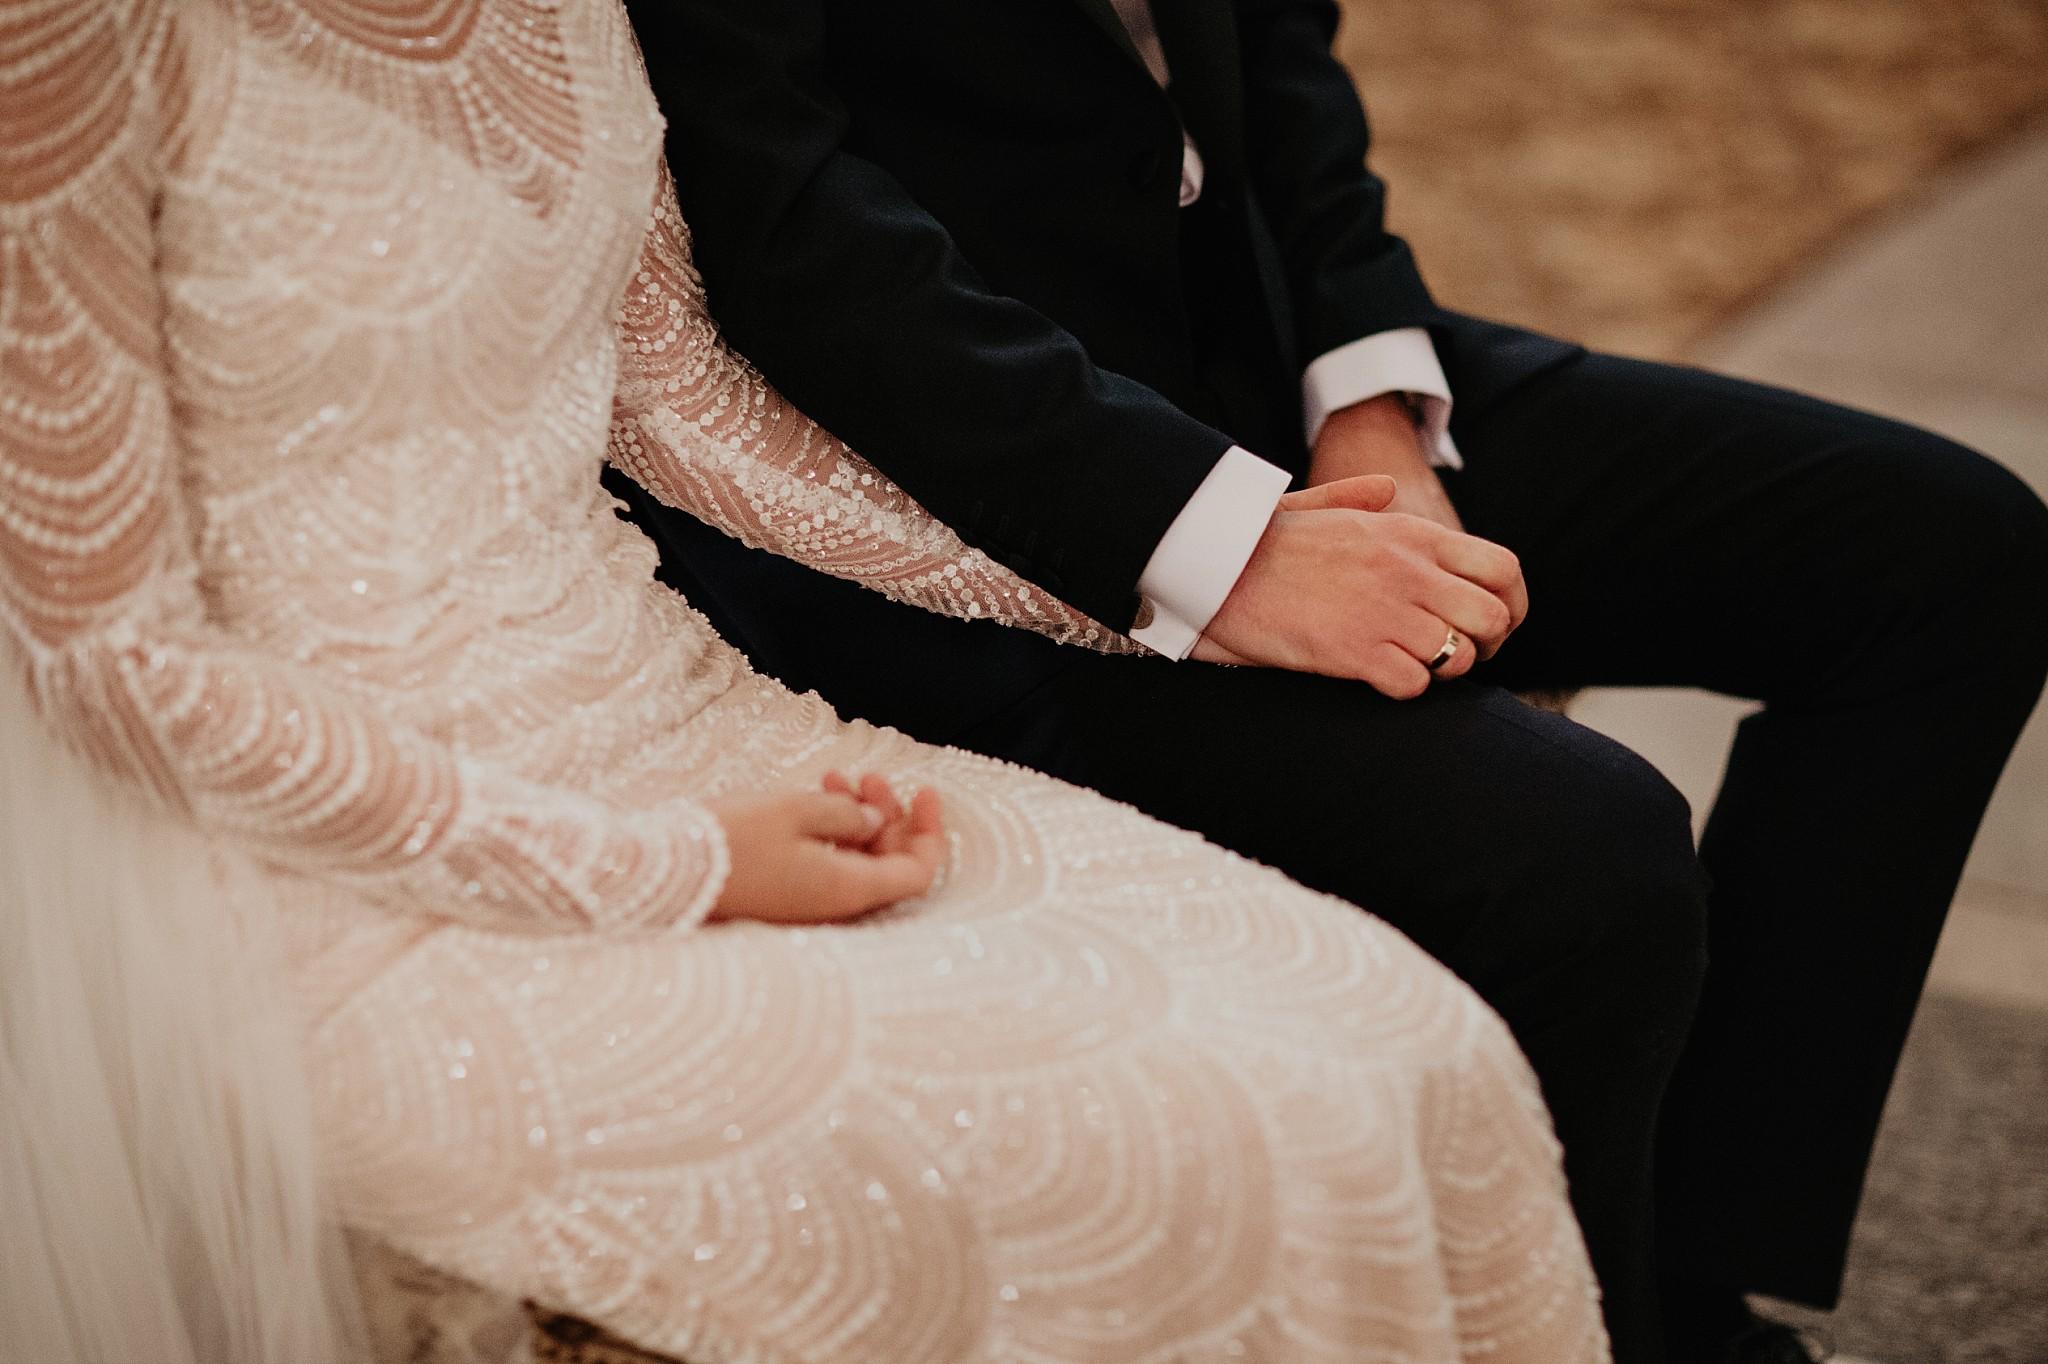 fotograf poznan wesele dobra truskawka piekne wesele pod poznaniem wesele w dobrej truskawce piekna para mloda slub marzen slub koronawirus slub listopad wesele koronawirus 198